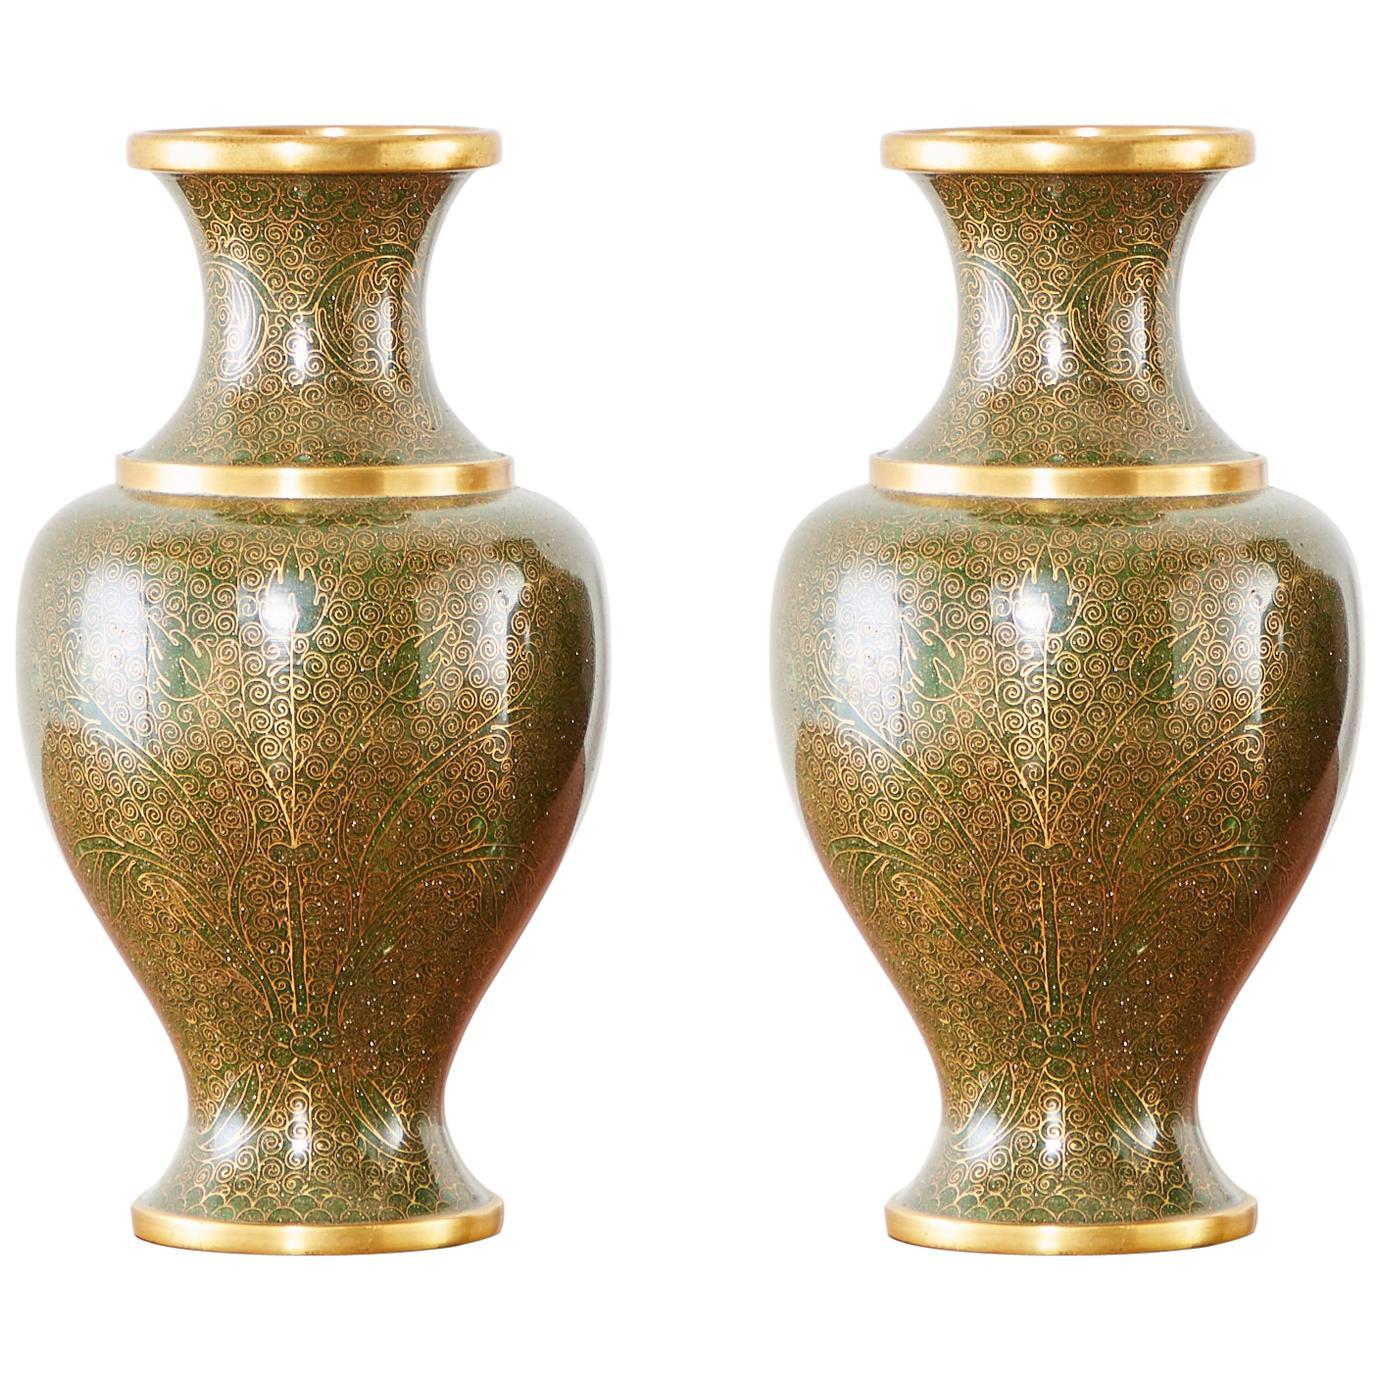 Pair of Chinese Cloisonné Enamel Baluster Vases